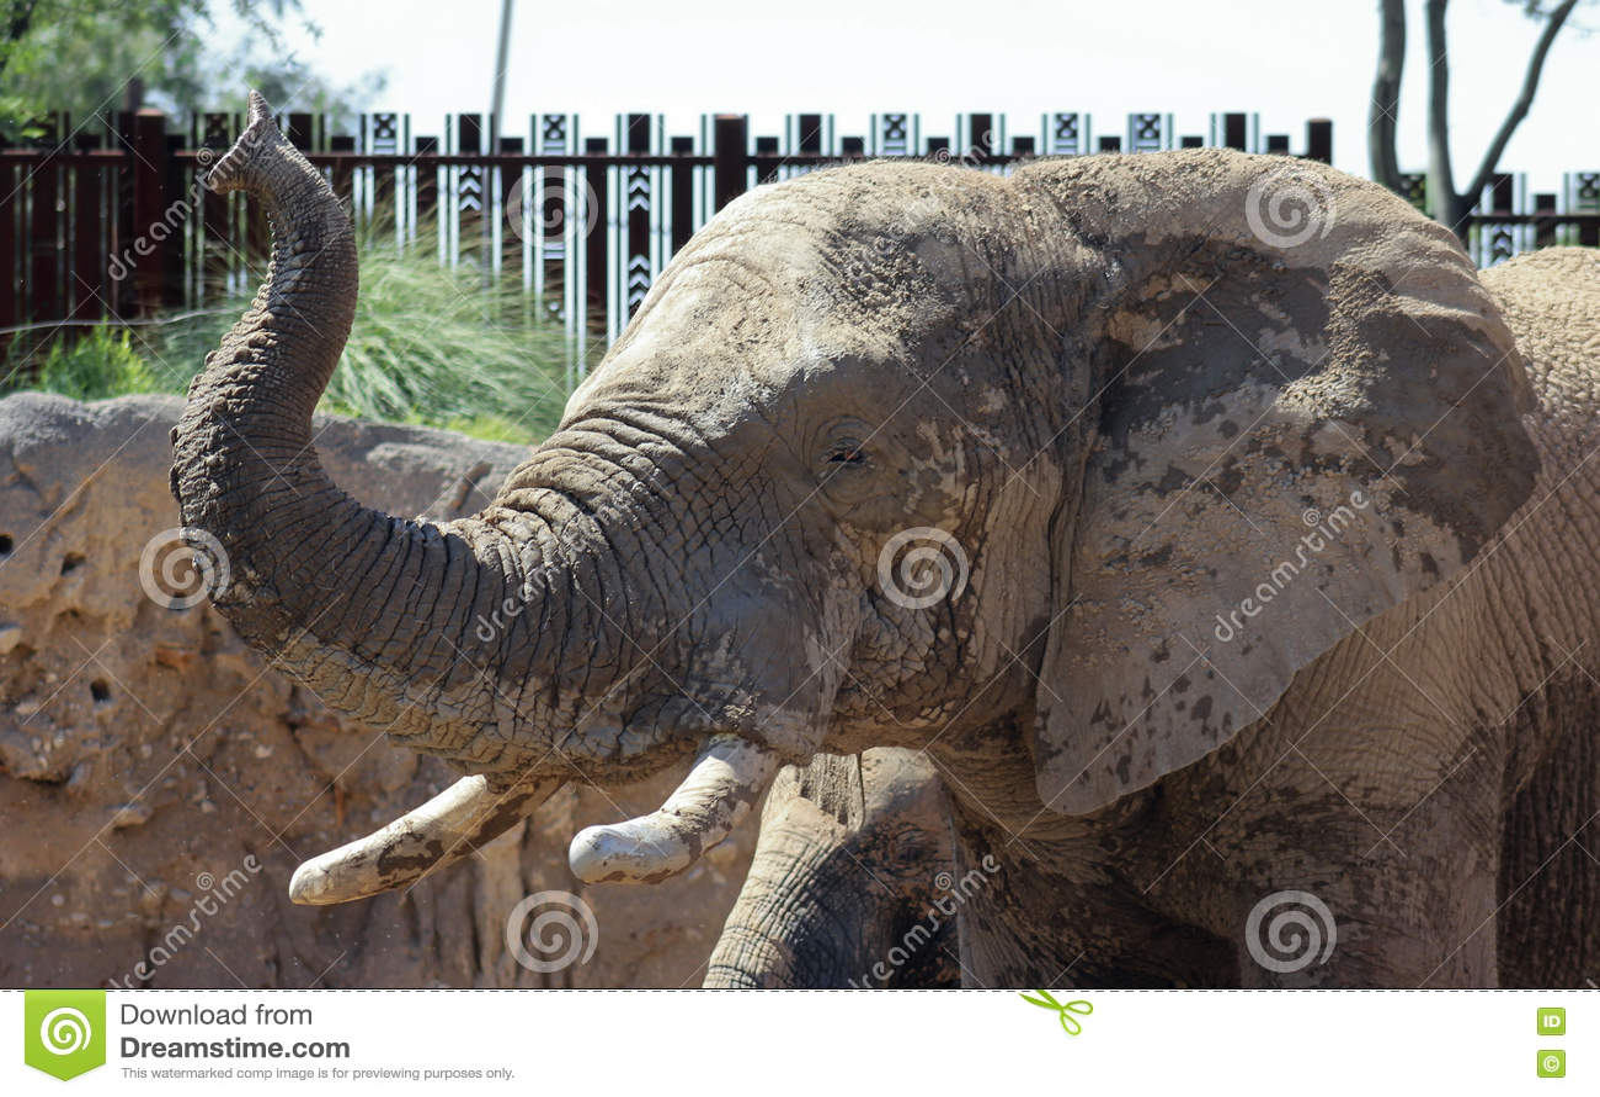 Reid Park Zoo Elephant, Tucson, Arizona